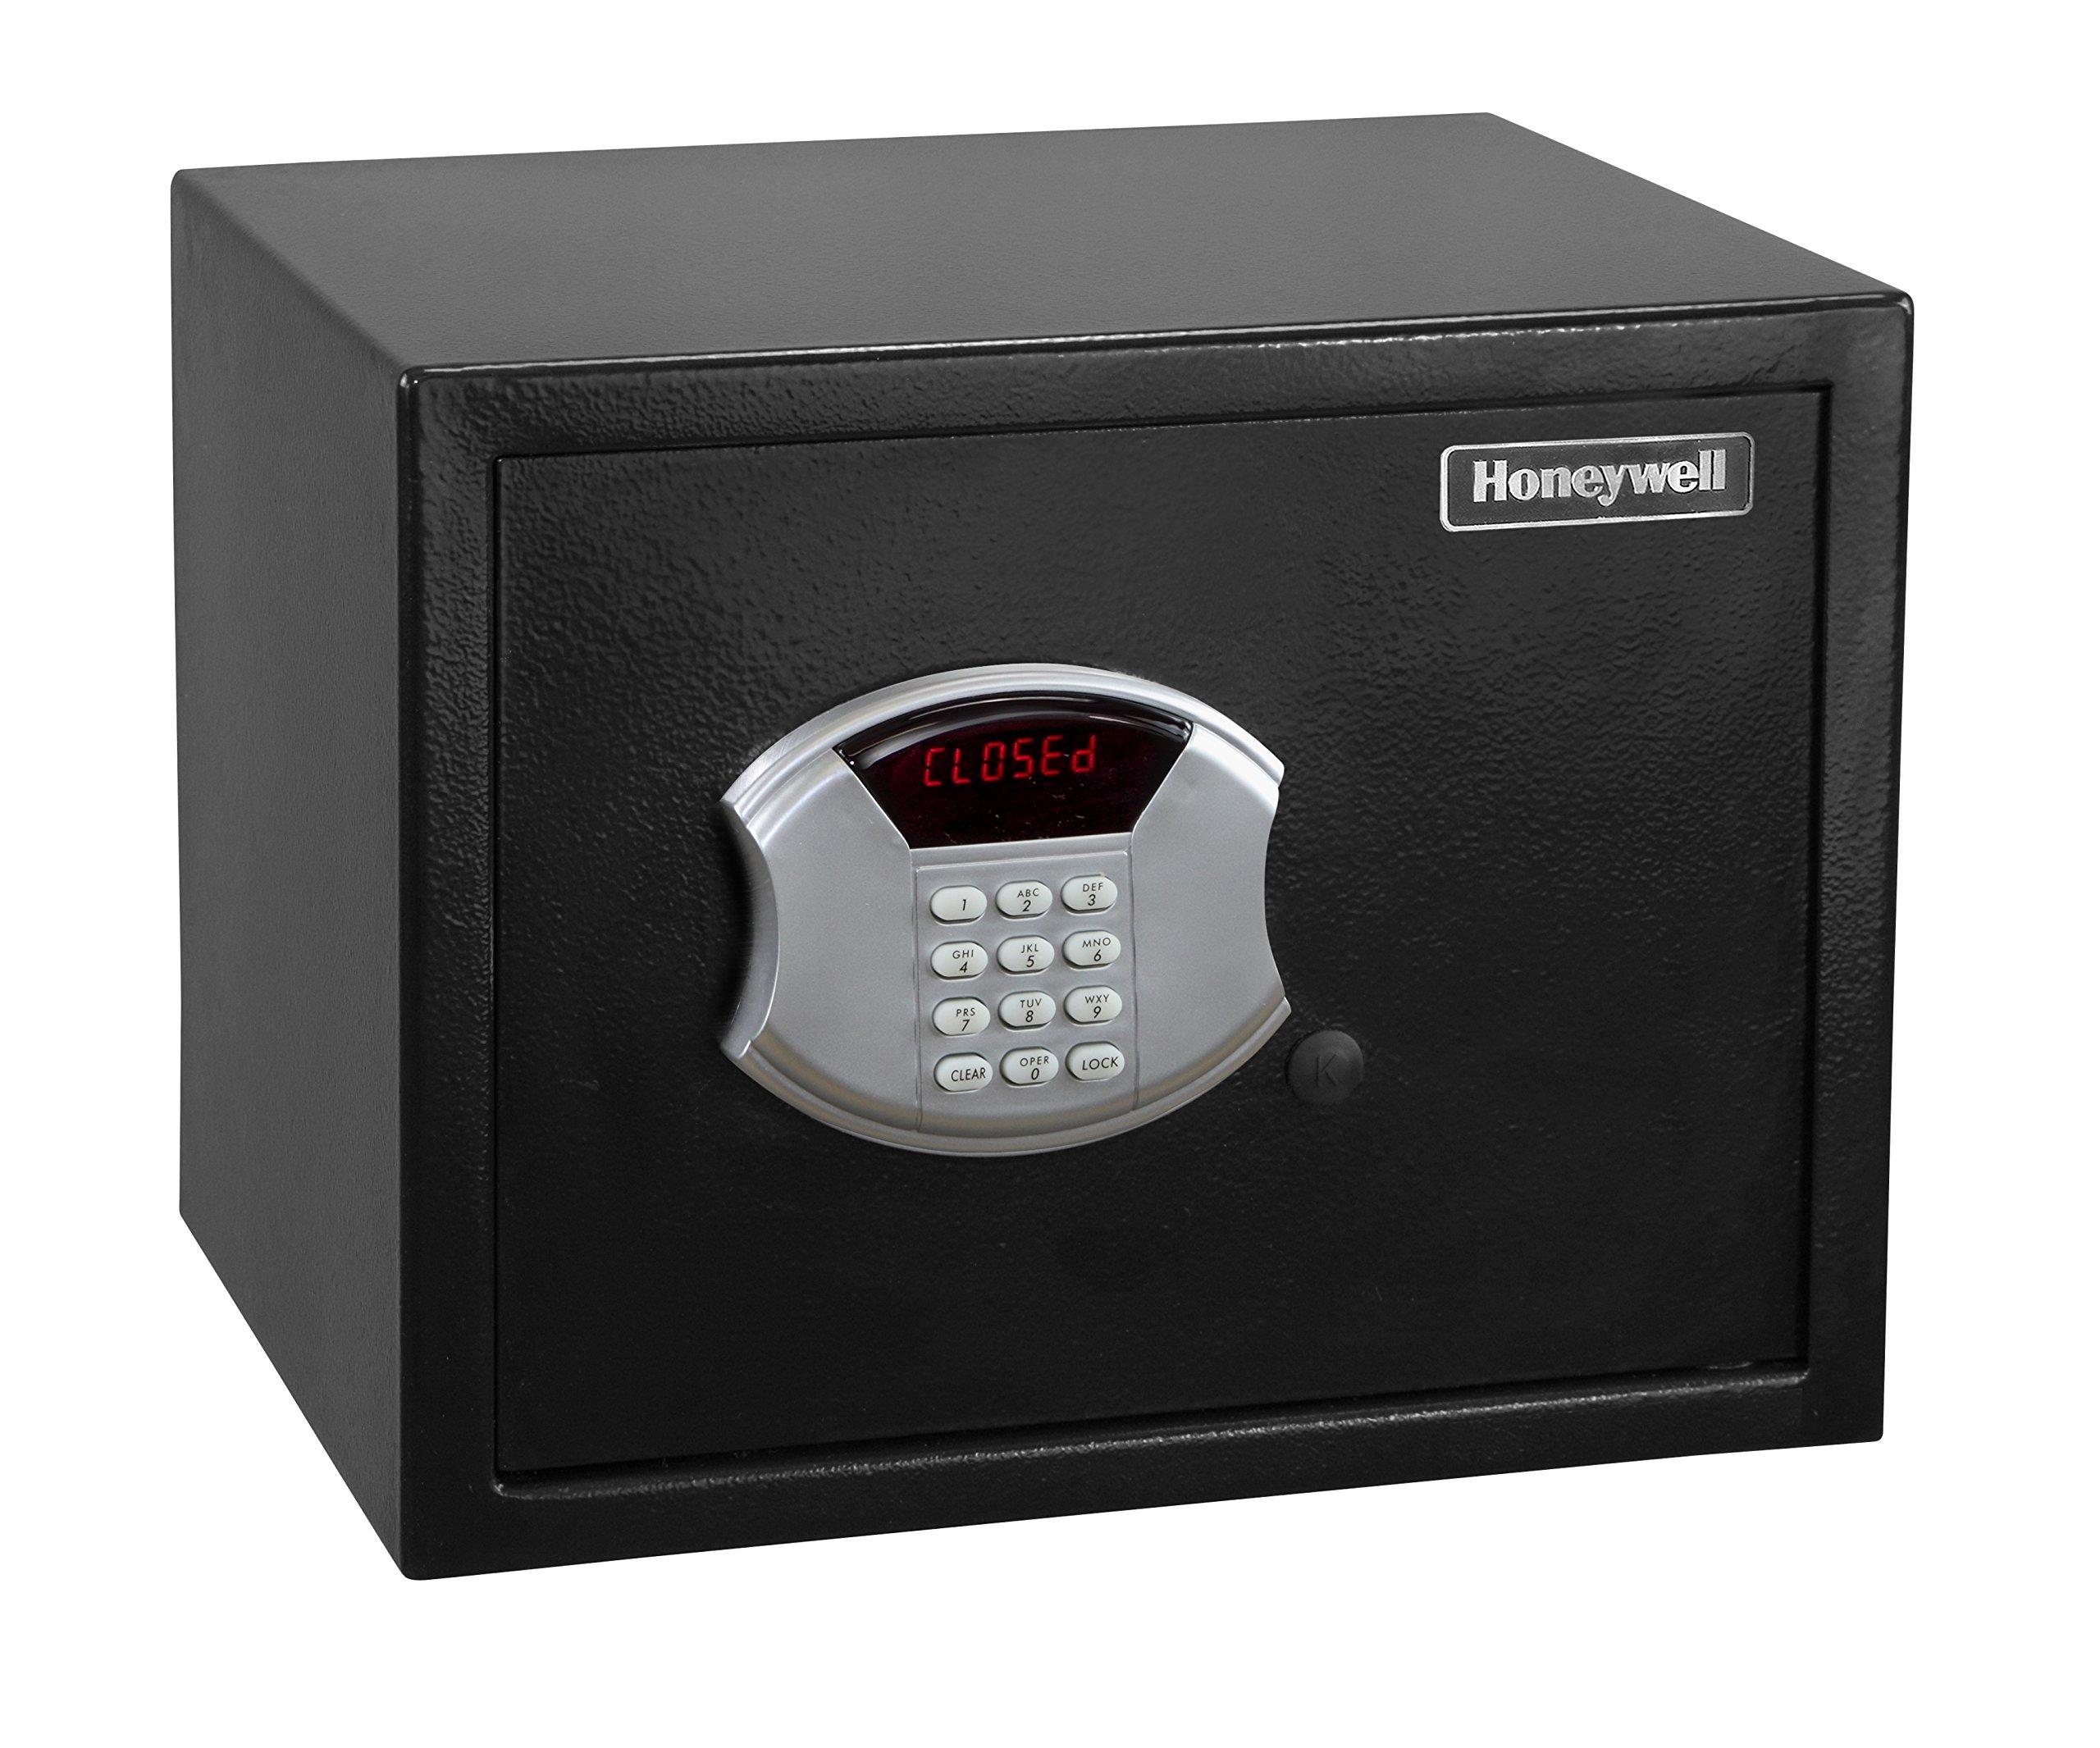 Honeywell 5103 Medium Steel Security Safe with Digital Lock, 0.83-Cubic Feet, Black